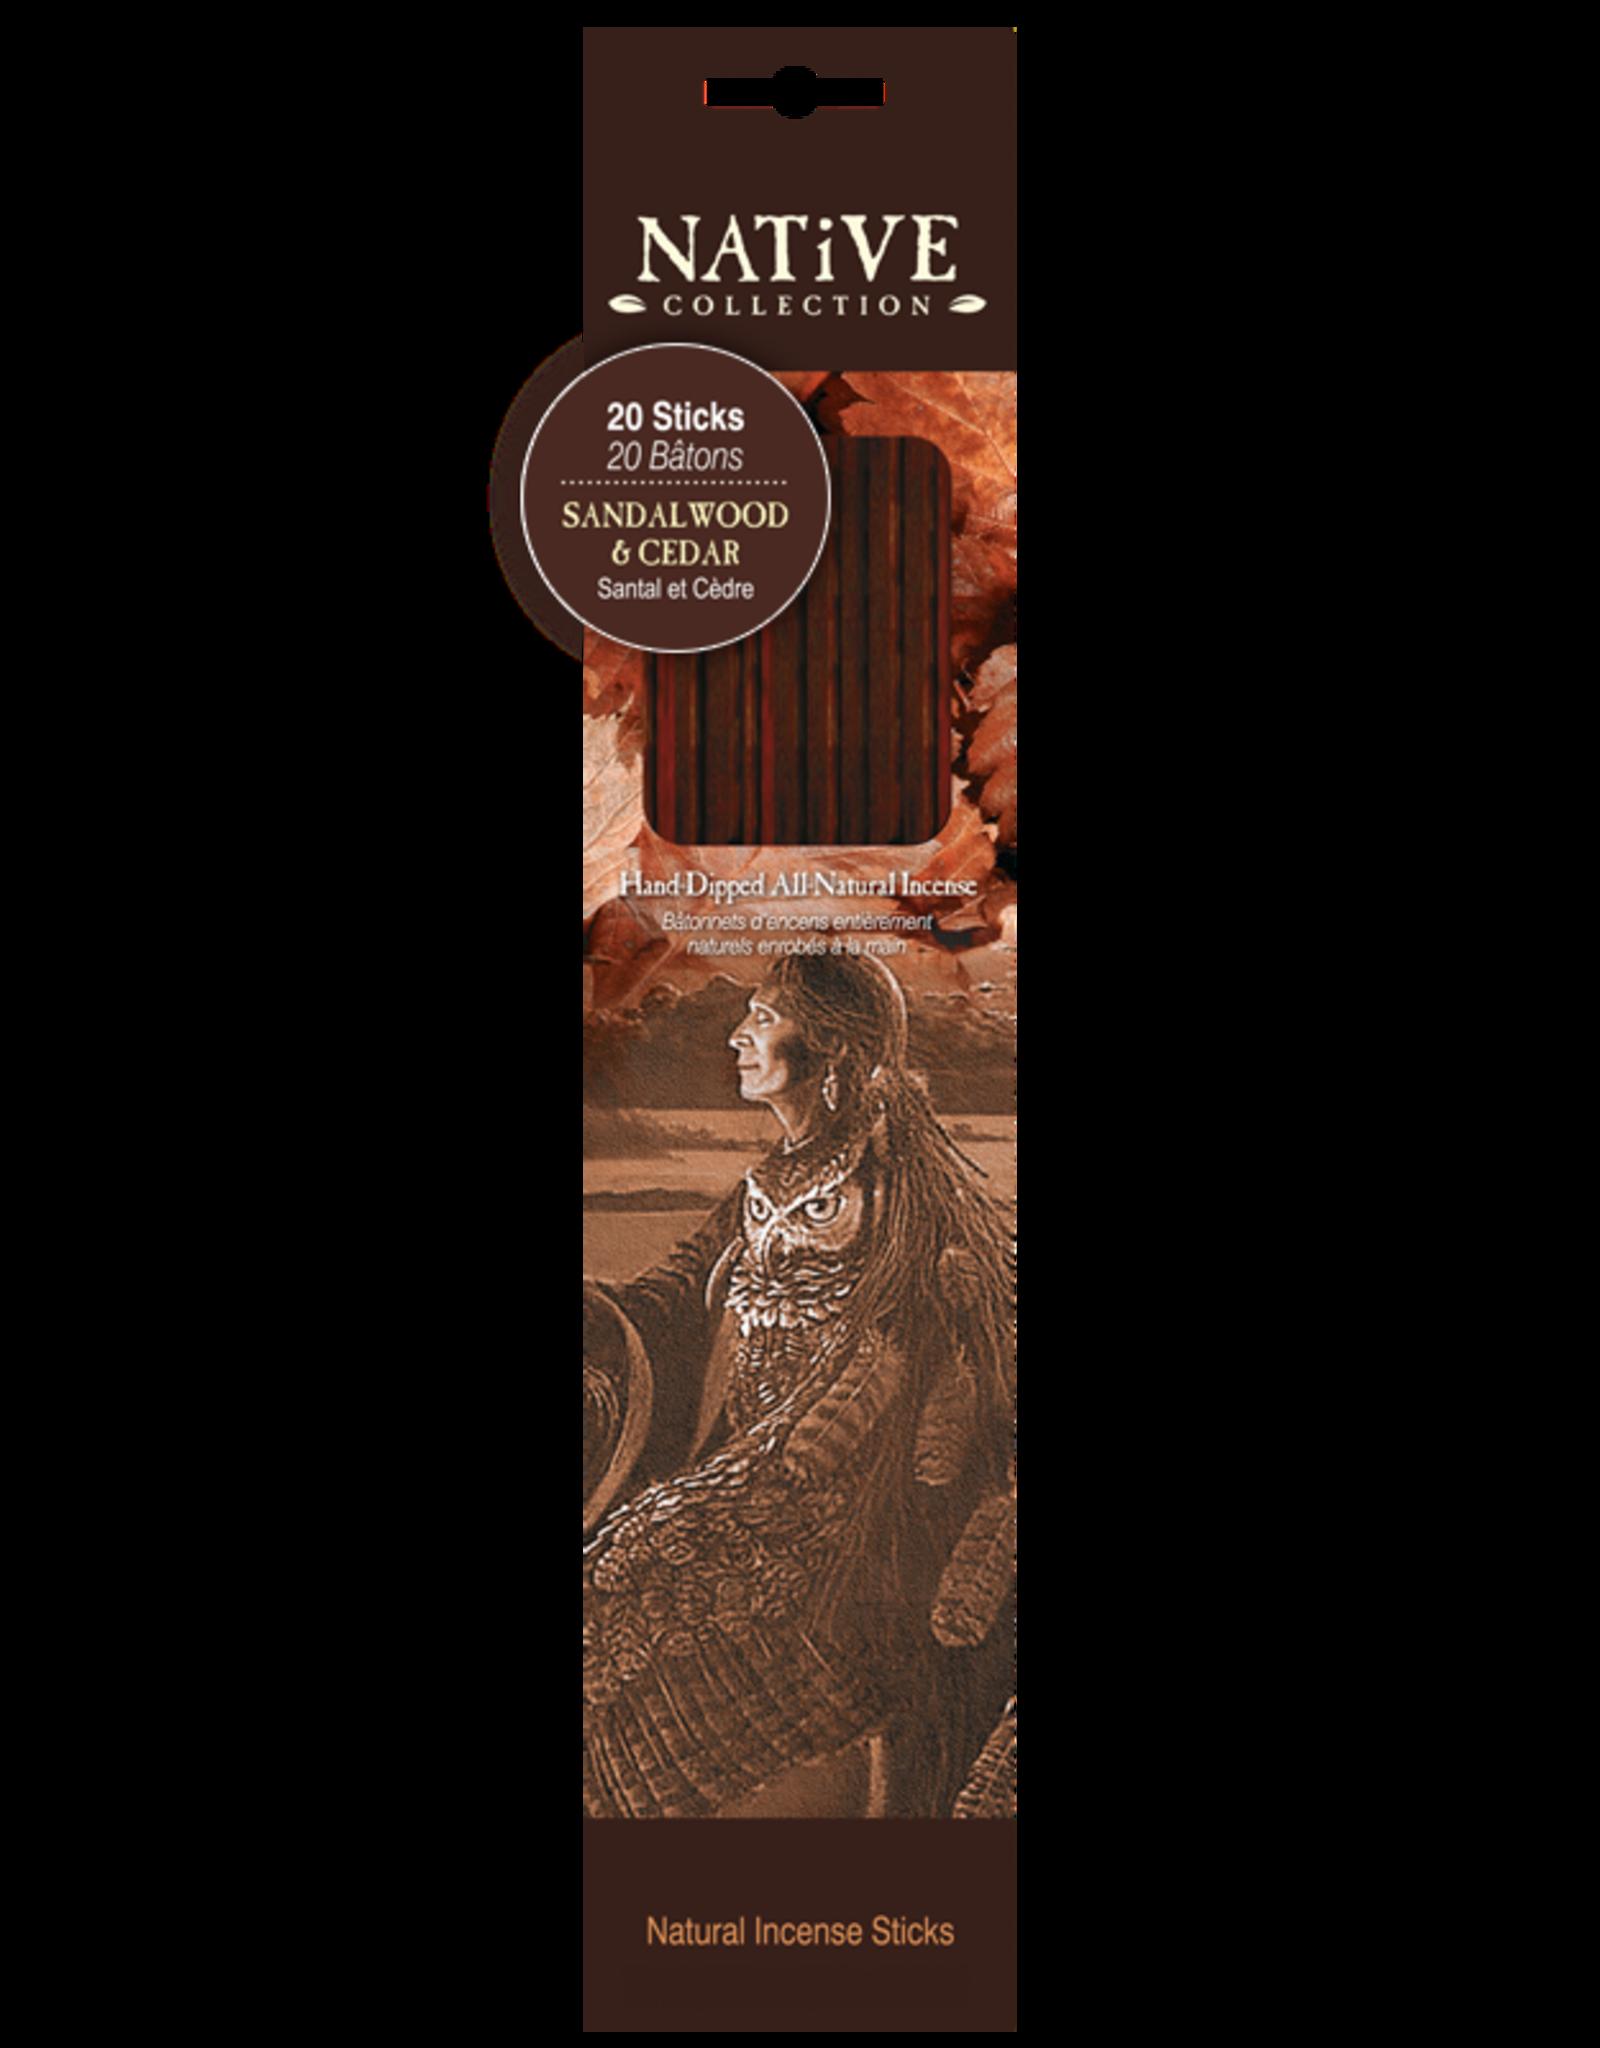 Native Collection Natural Incense Sticks